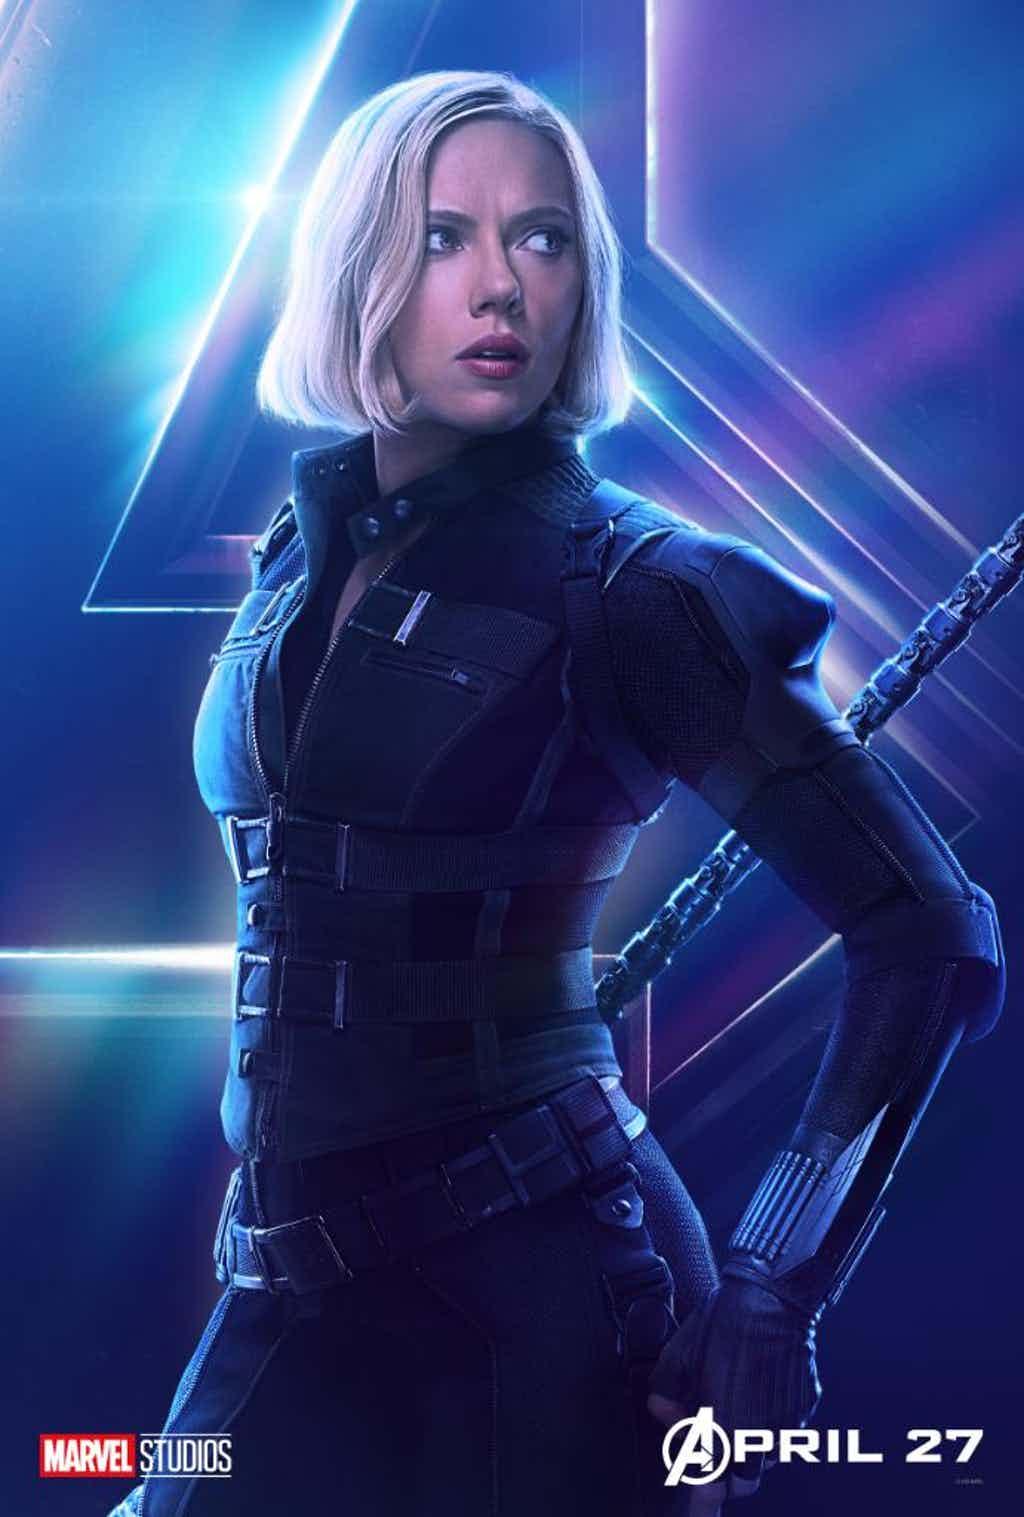 szmk_marvel_infinity_war_vegtelen_haboru_bosszuallok_avengers_ironman_hulk_thor_captainamaerica_guardians_galaxy_22.jpg